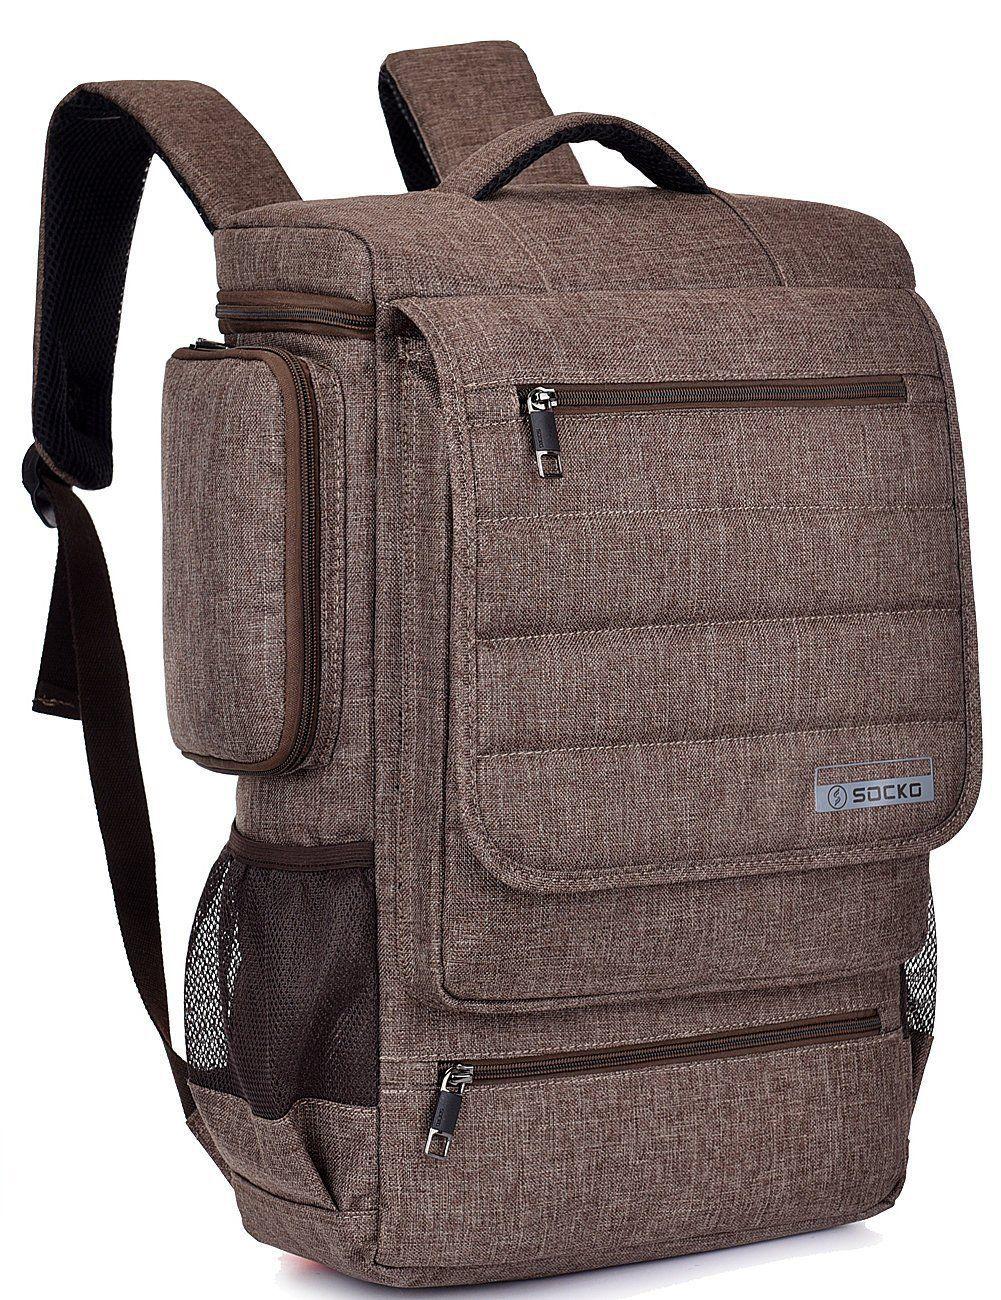 Top 7 Best Laptop Backpacks Top 7 Best Laptop Backpacks Rucksack